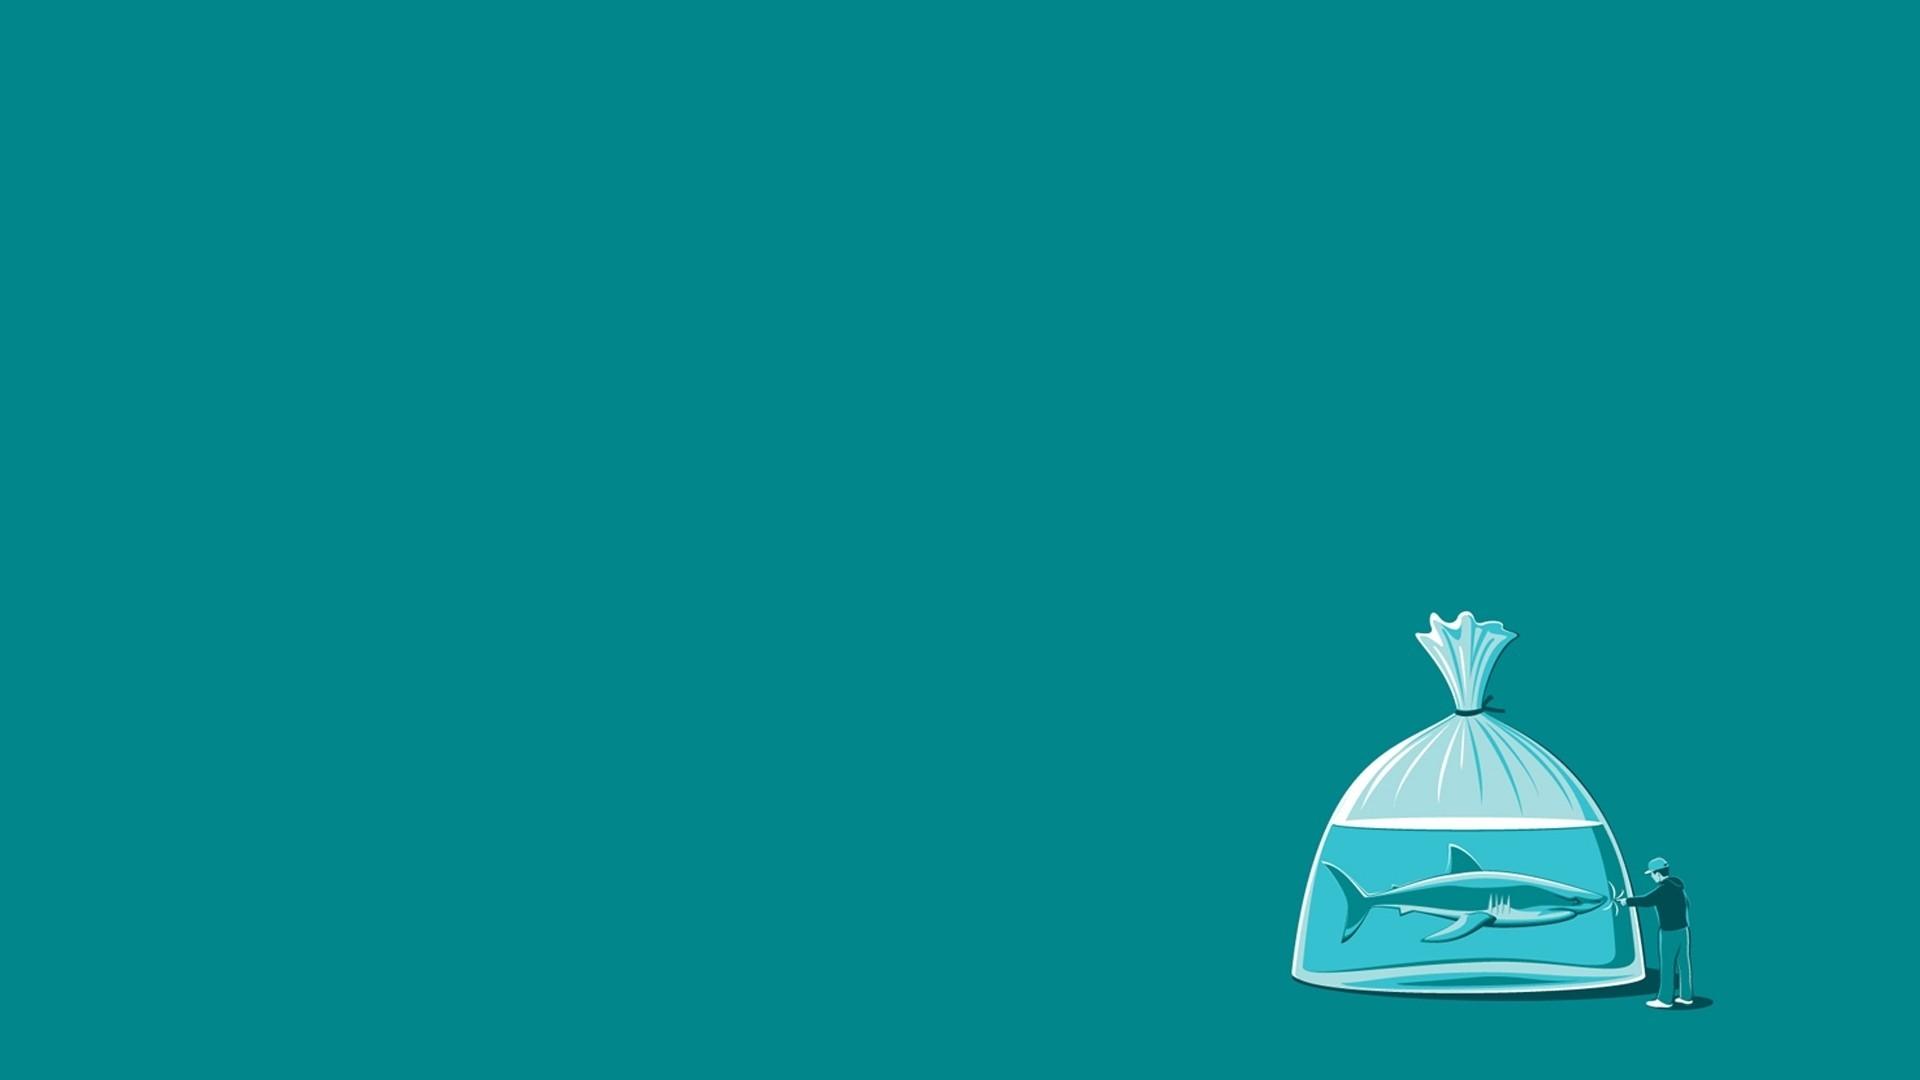 Humorous Wallpapers For Desktop Wallpapertag: Awesome Funny Shark HD Wallpaper